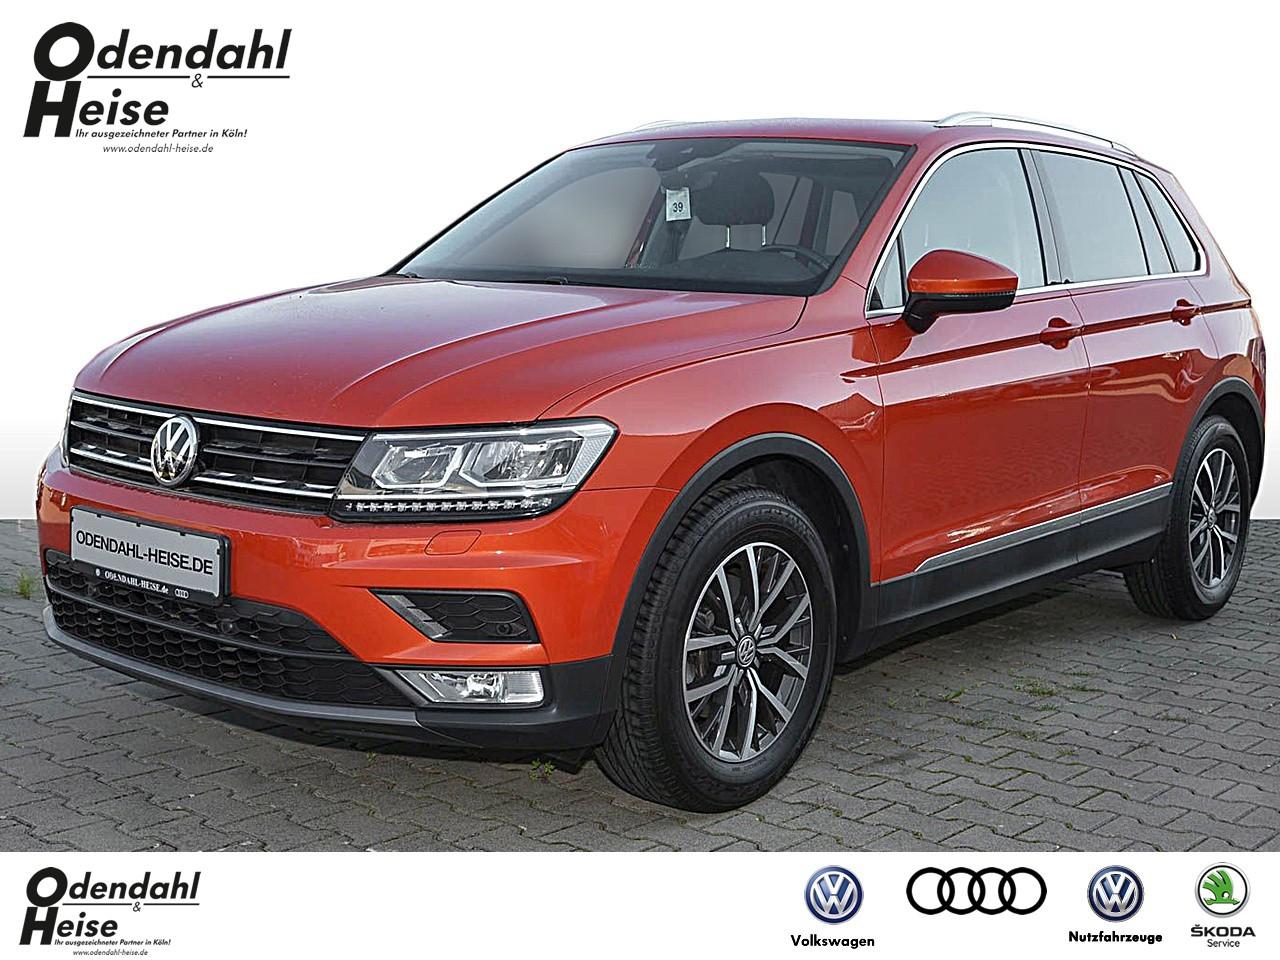 Volkswagen Tiguan Comfortline BMT 1,4 l TSI EU6 Klima Navi, Jahr 2017, Benzin